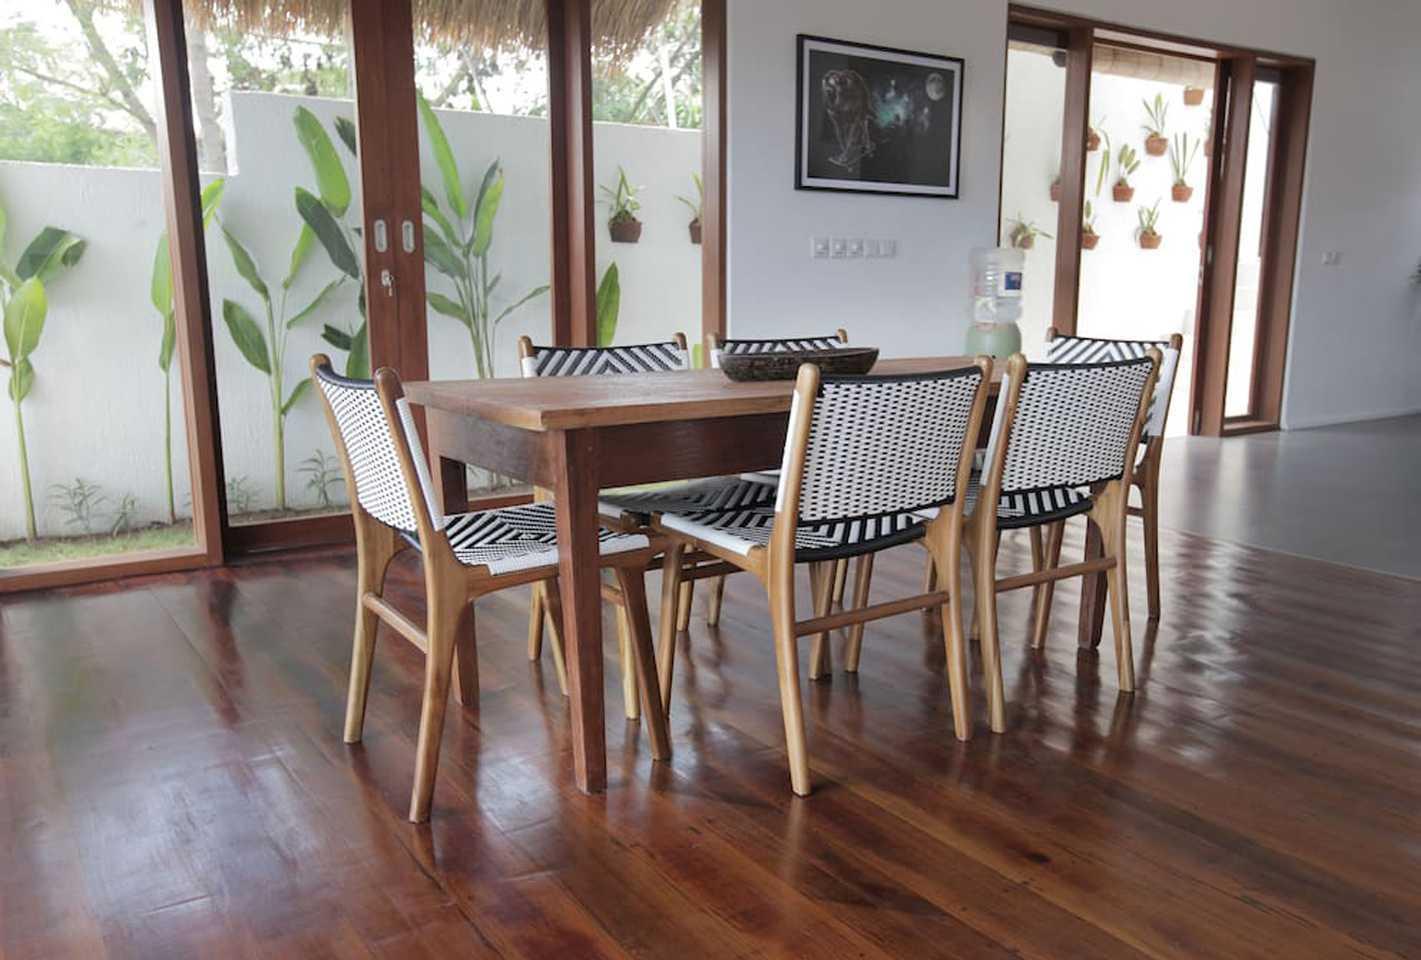 Hg Architects & Designers Associates Villa Pererenan Pererenan, Mengwi, Kabupaten Badung, Bali, Indonesia Pererenan, Mengwi, Kabupaten Badung, Bali, Indonesia Dining Area   48592